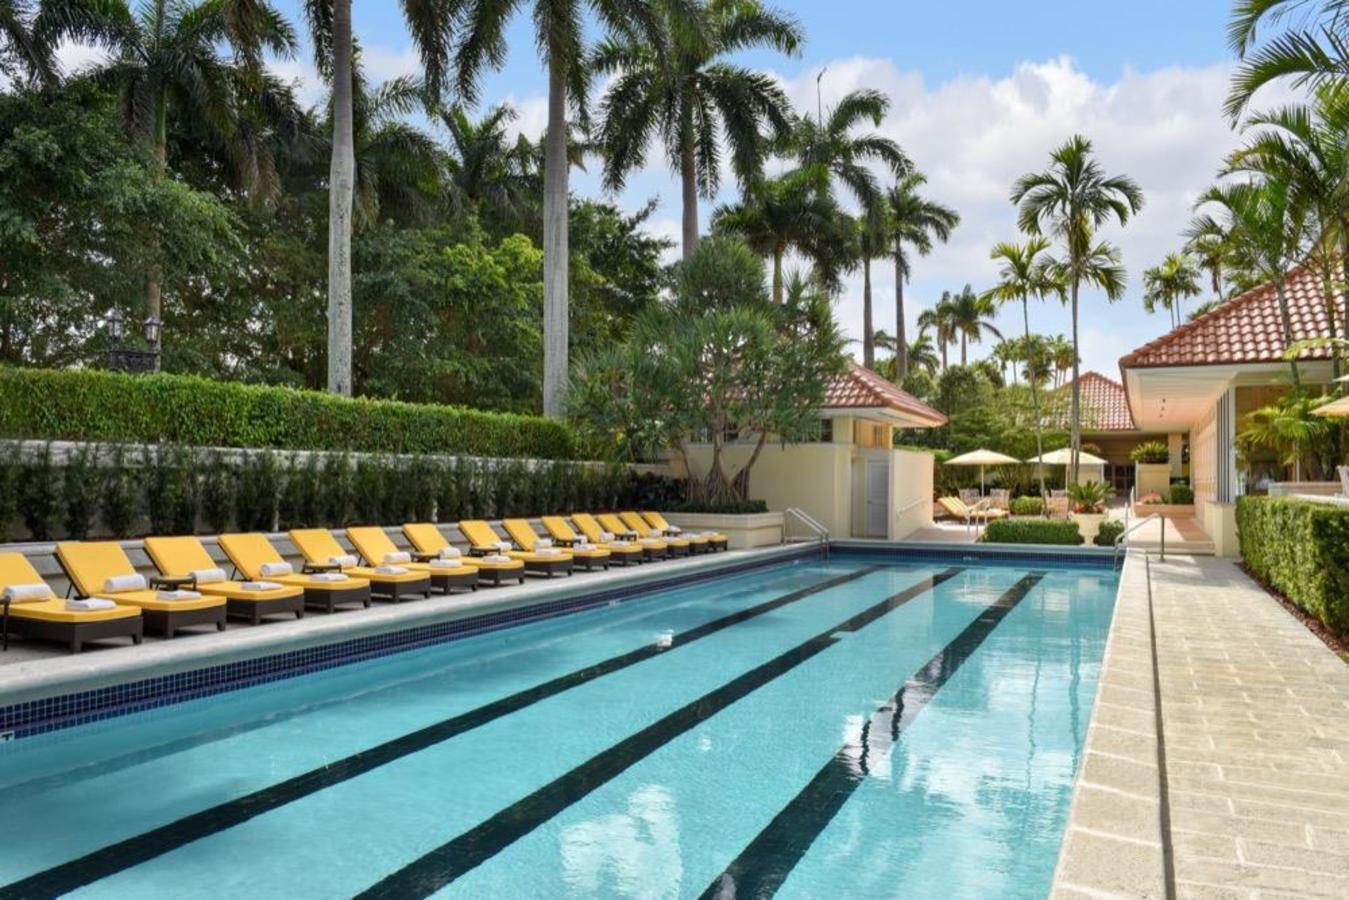 The Trump Spa 25-meter Outdoor Lap Pool